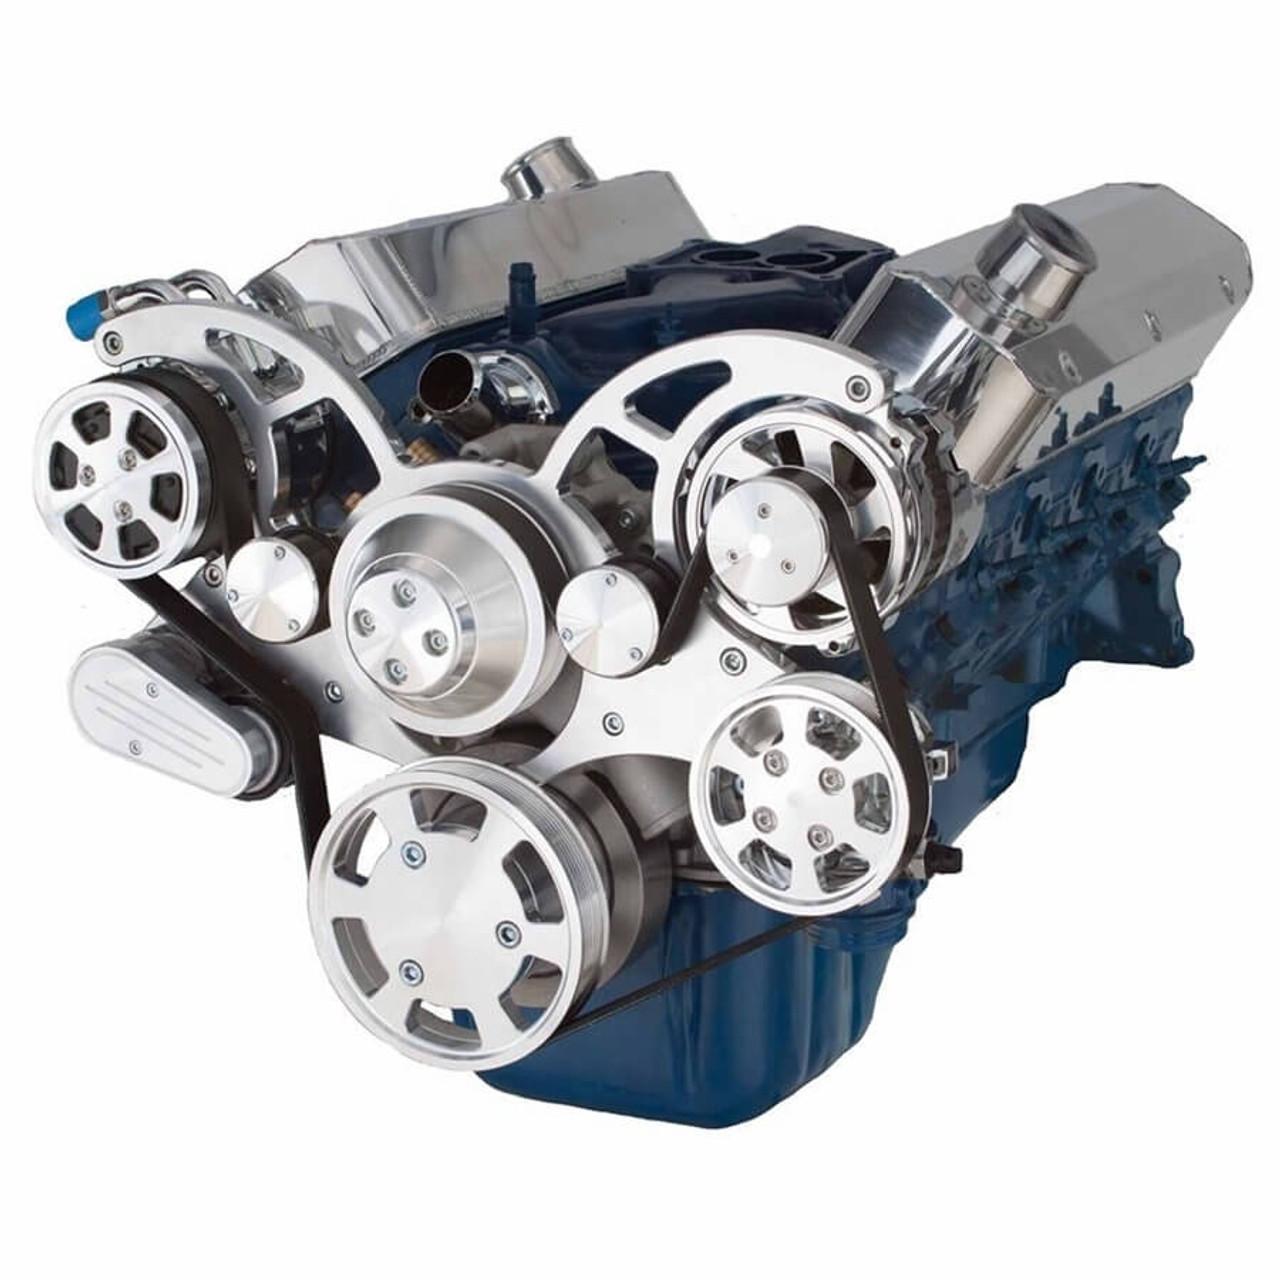 1977 351 cleveland engine diagram [ 900 x 900 Pixel ]